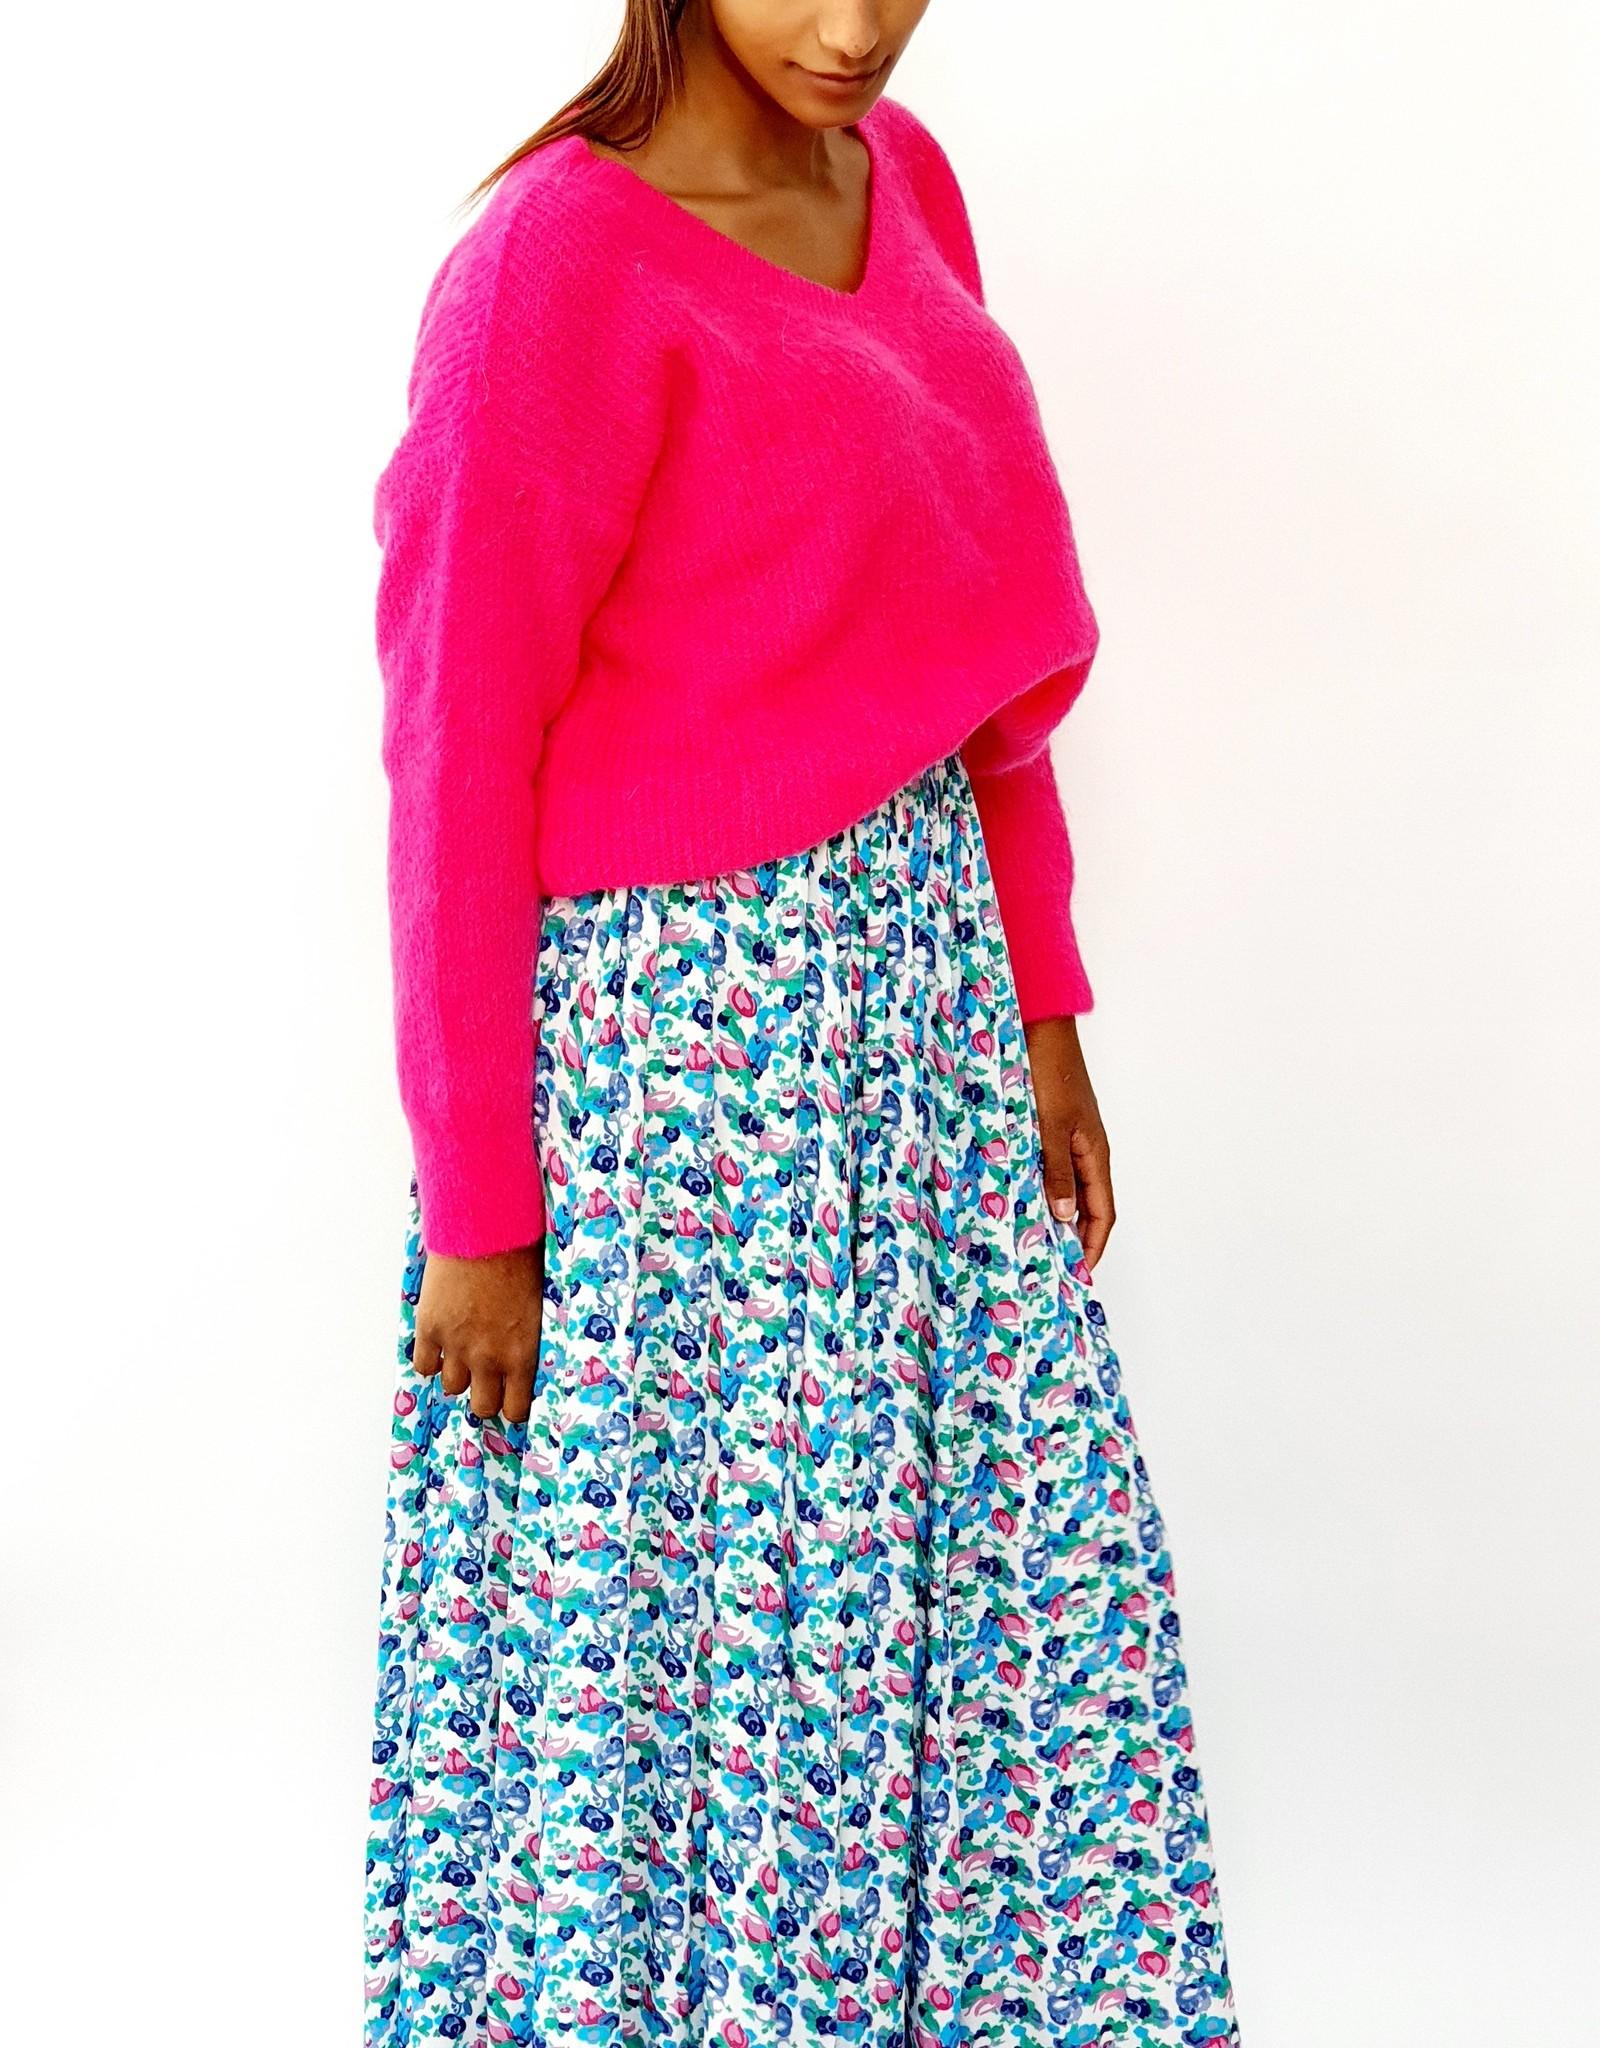 Thé girly skirt